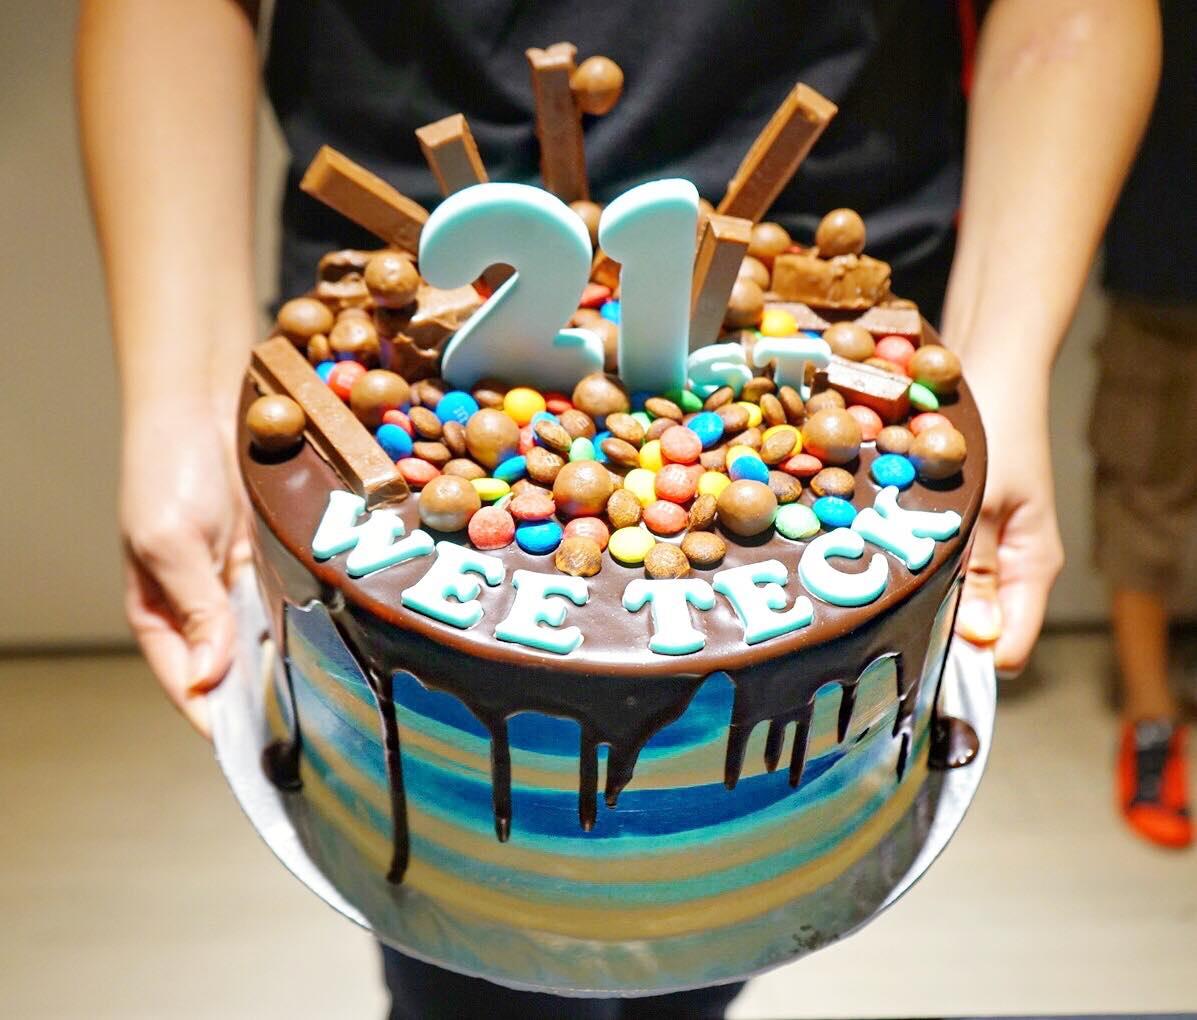 sweetest-moments-21st-birthday-cake-aspirantsg